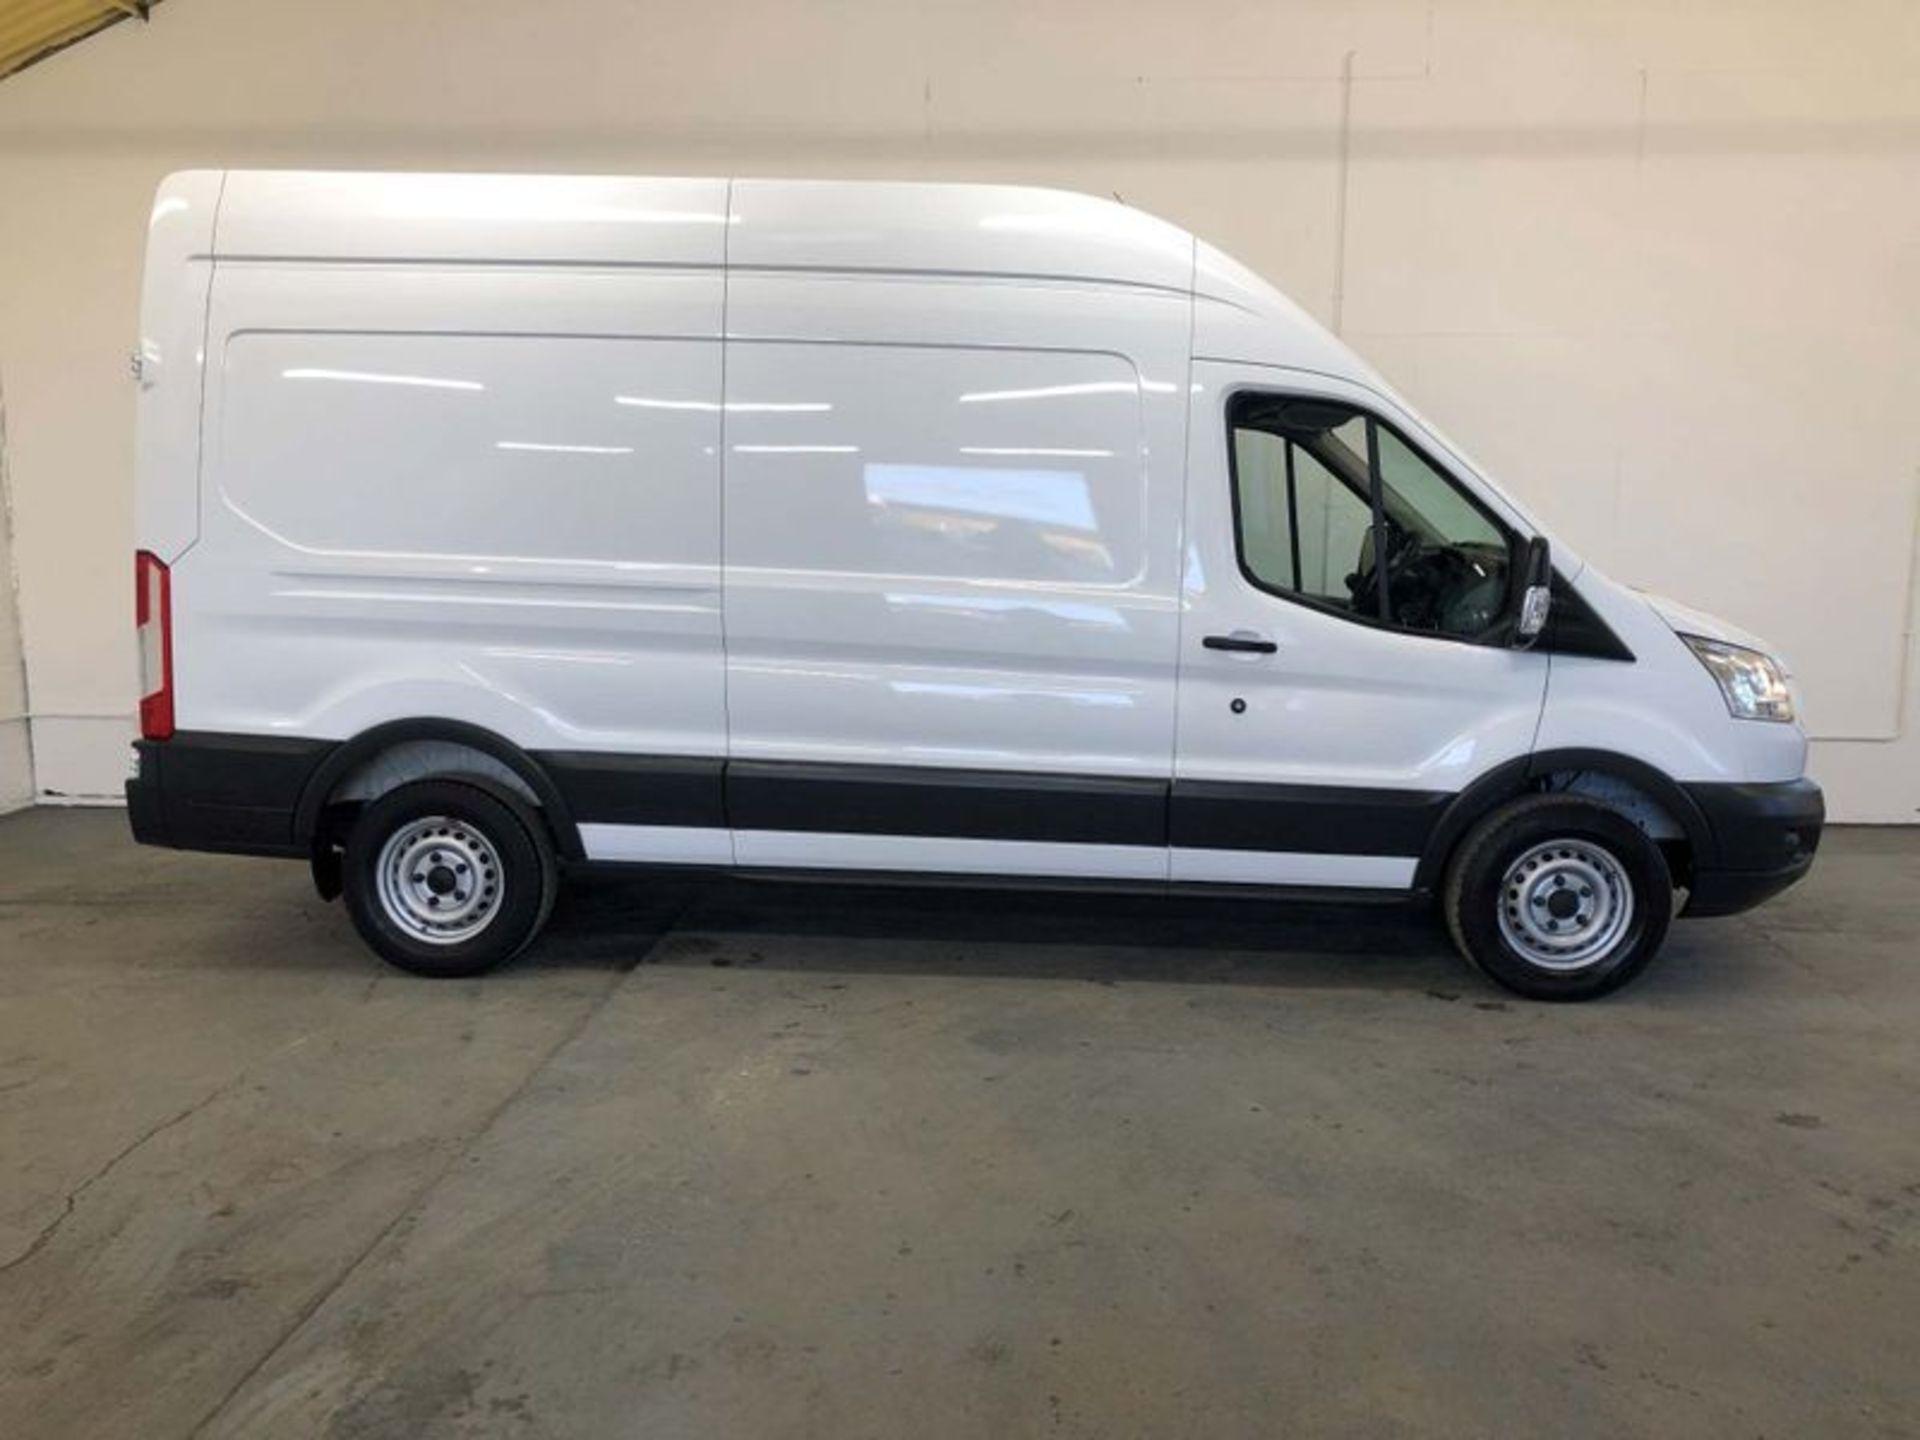 Lot 15a - Ford Transit T350 2.2 TDCI Long Wheel Base High Roof Van - 6 Speed - 2015 Model -